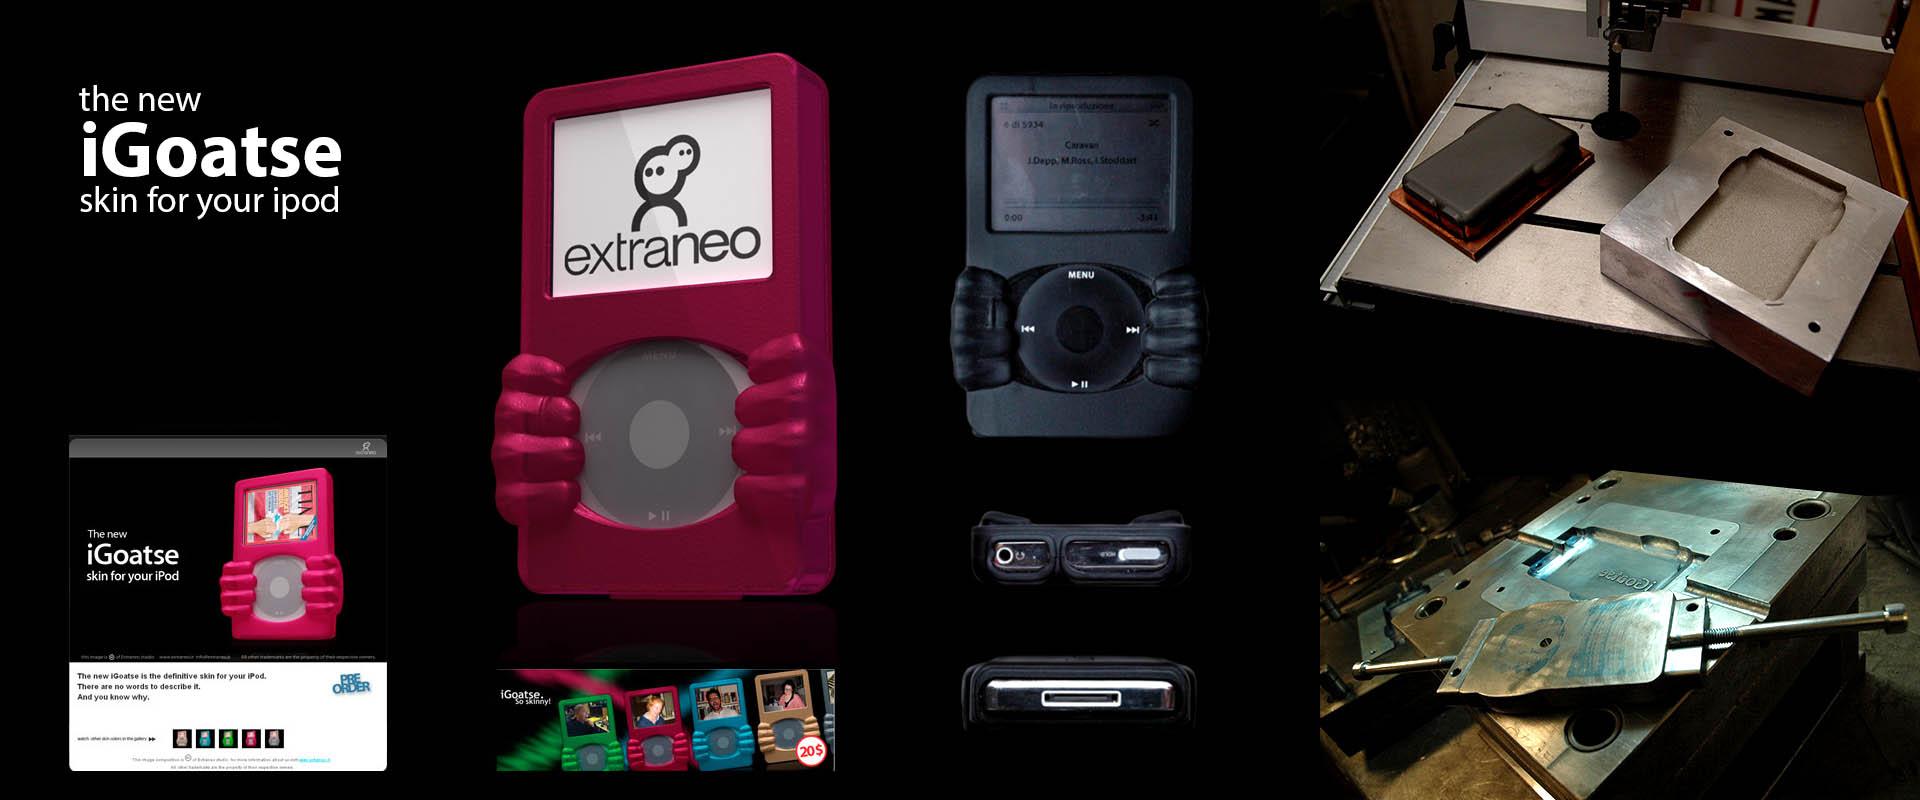 aironic_ugo_capparelli_design_extraneo_igoatse